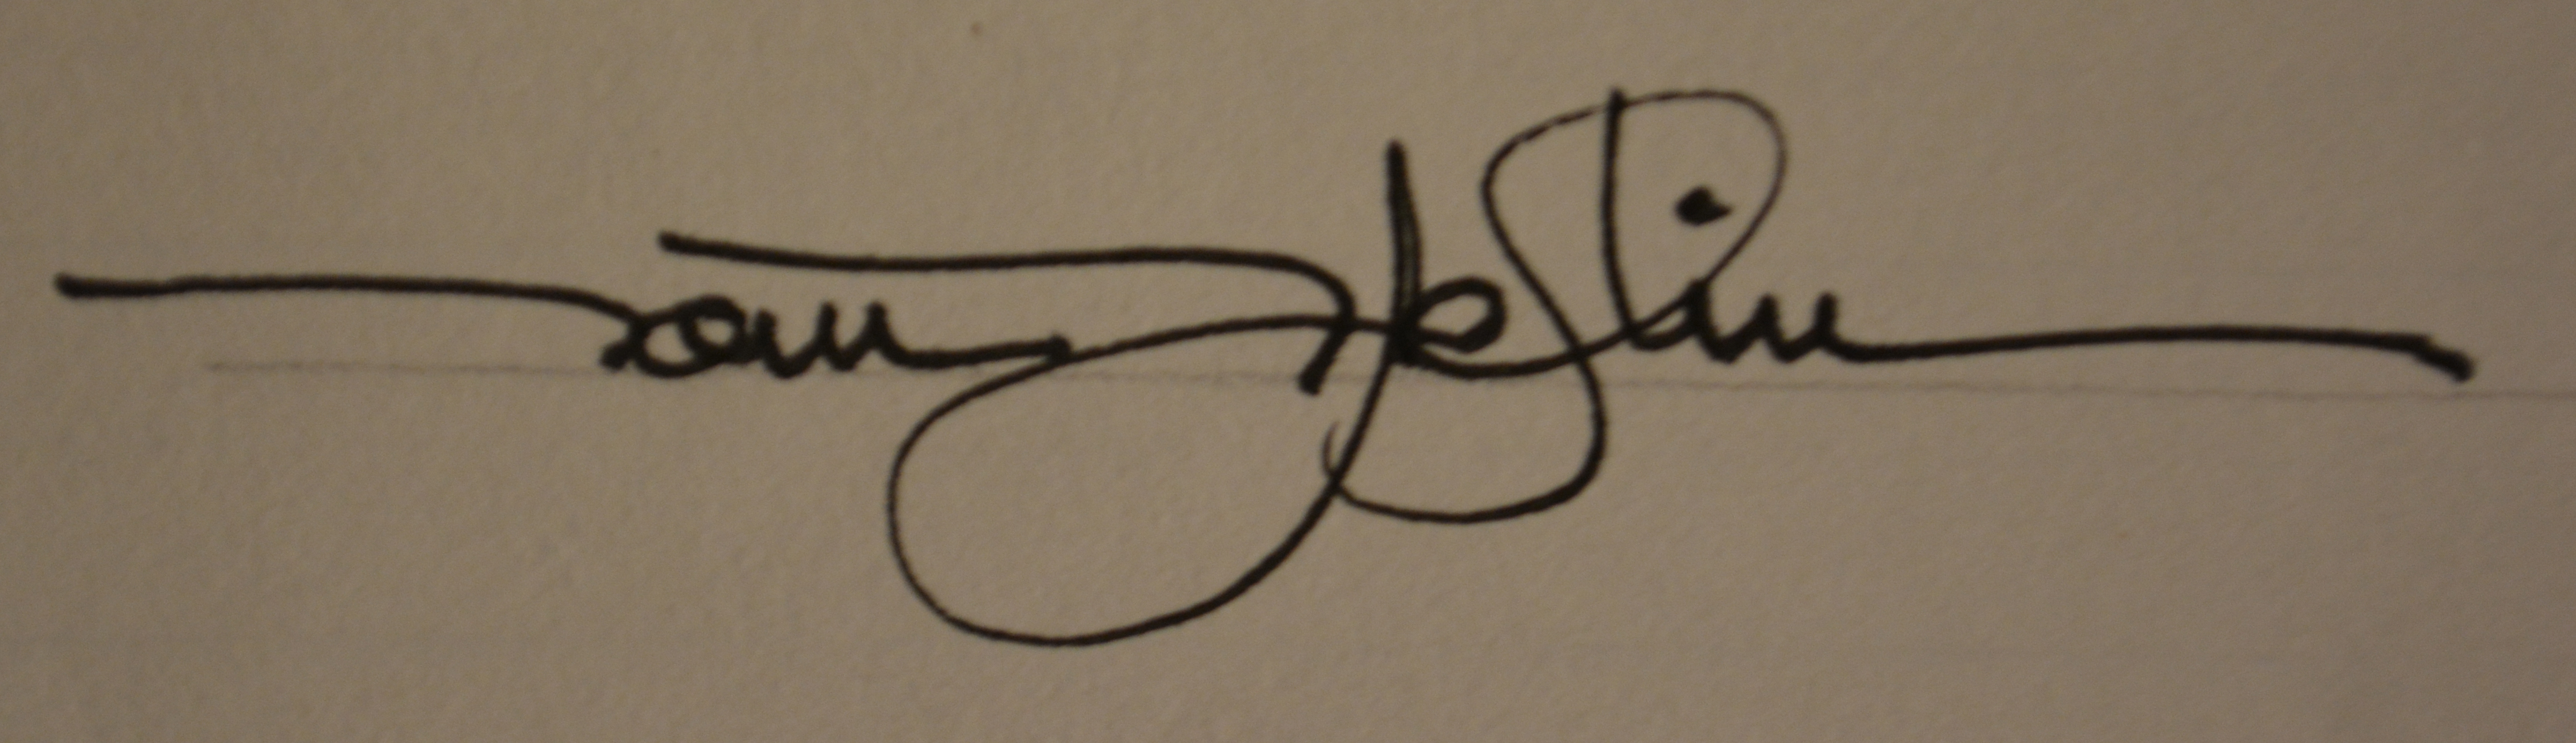 Thomas Patrick Heflin Signature